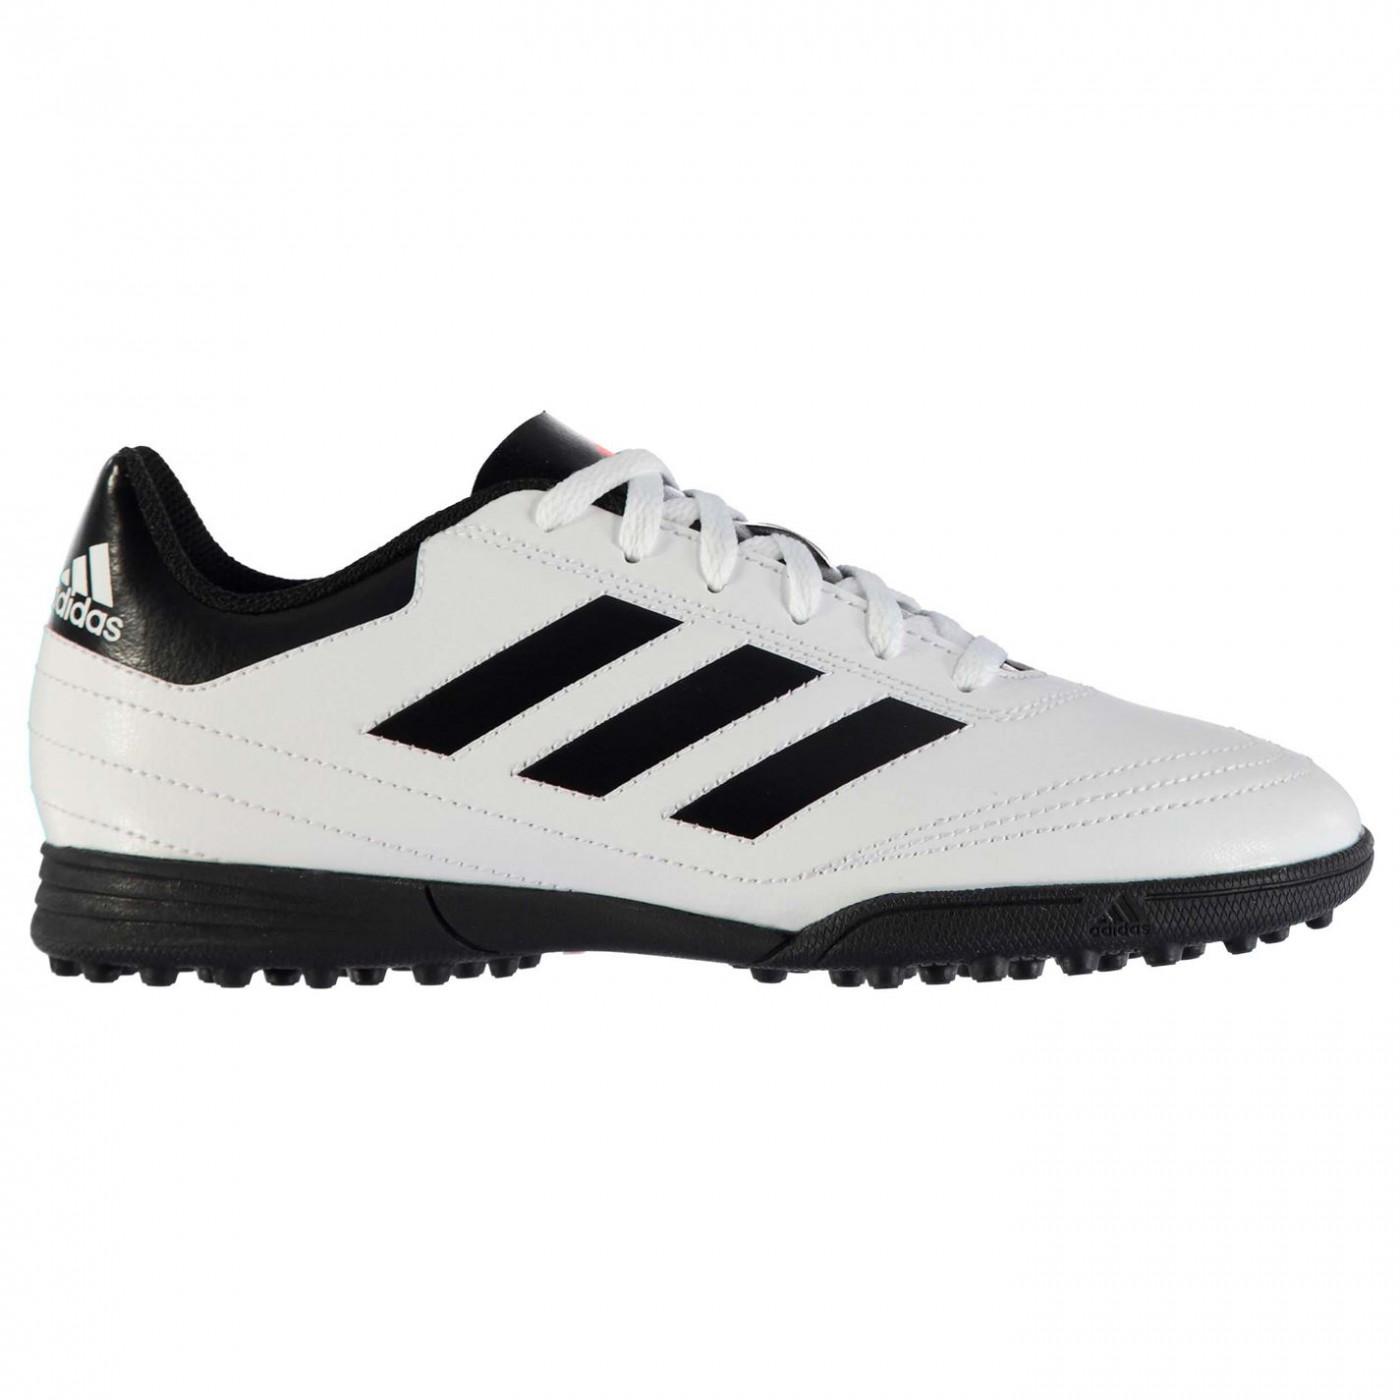 Adidas Goletto Astro Turf Trainers